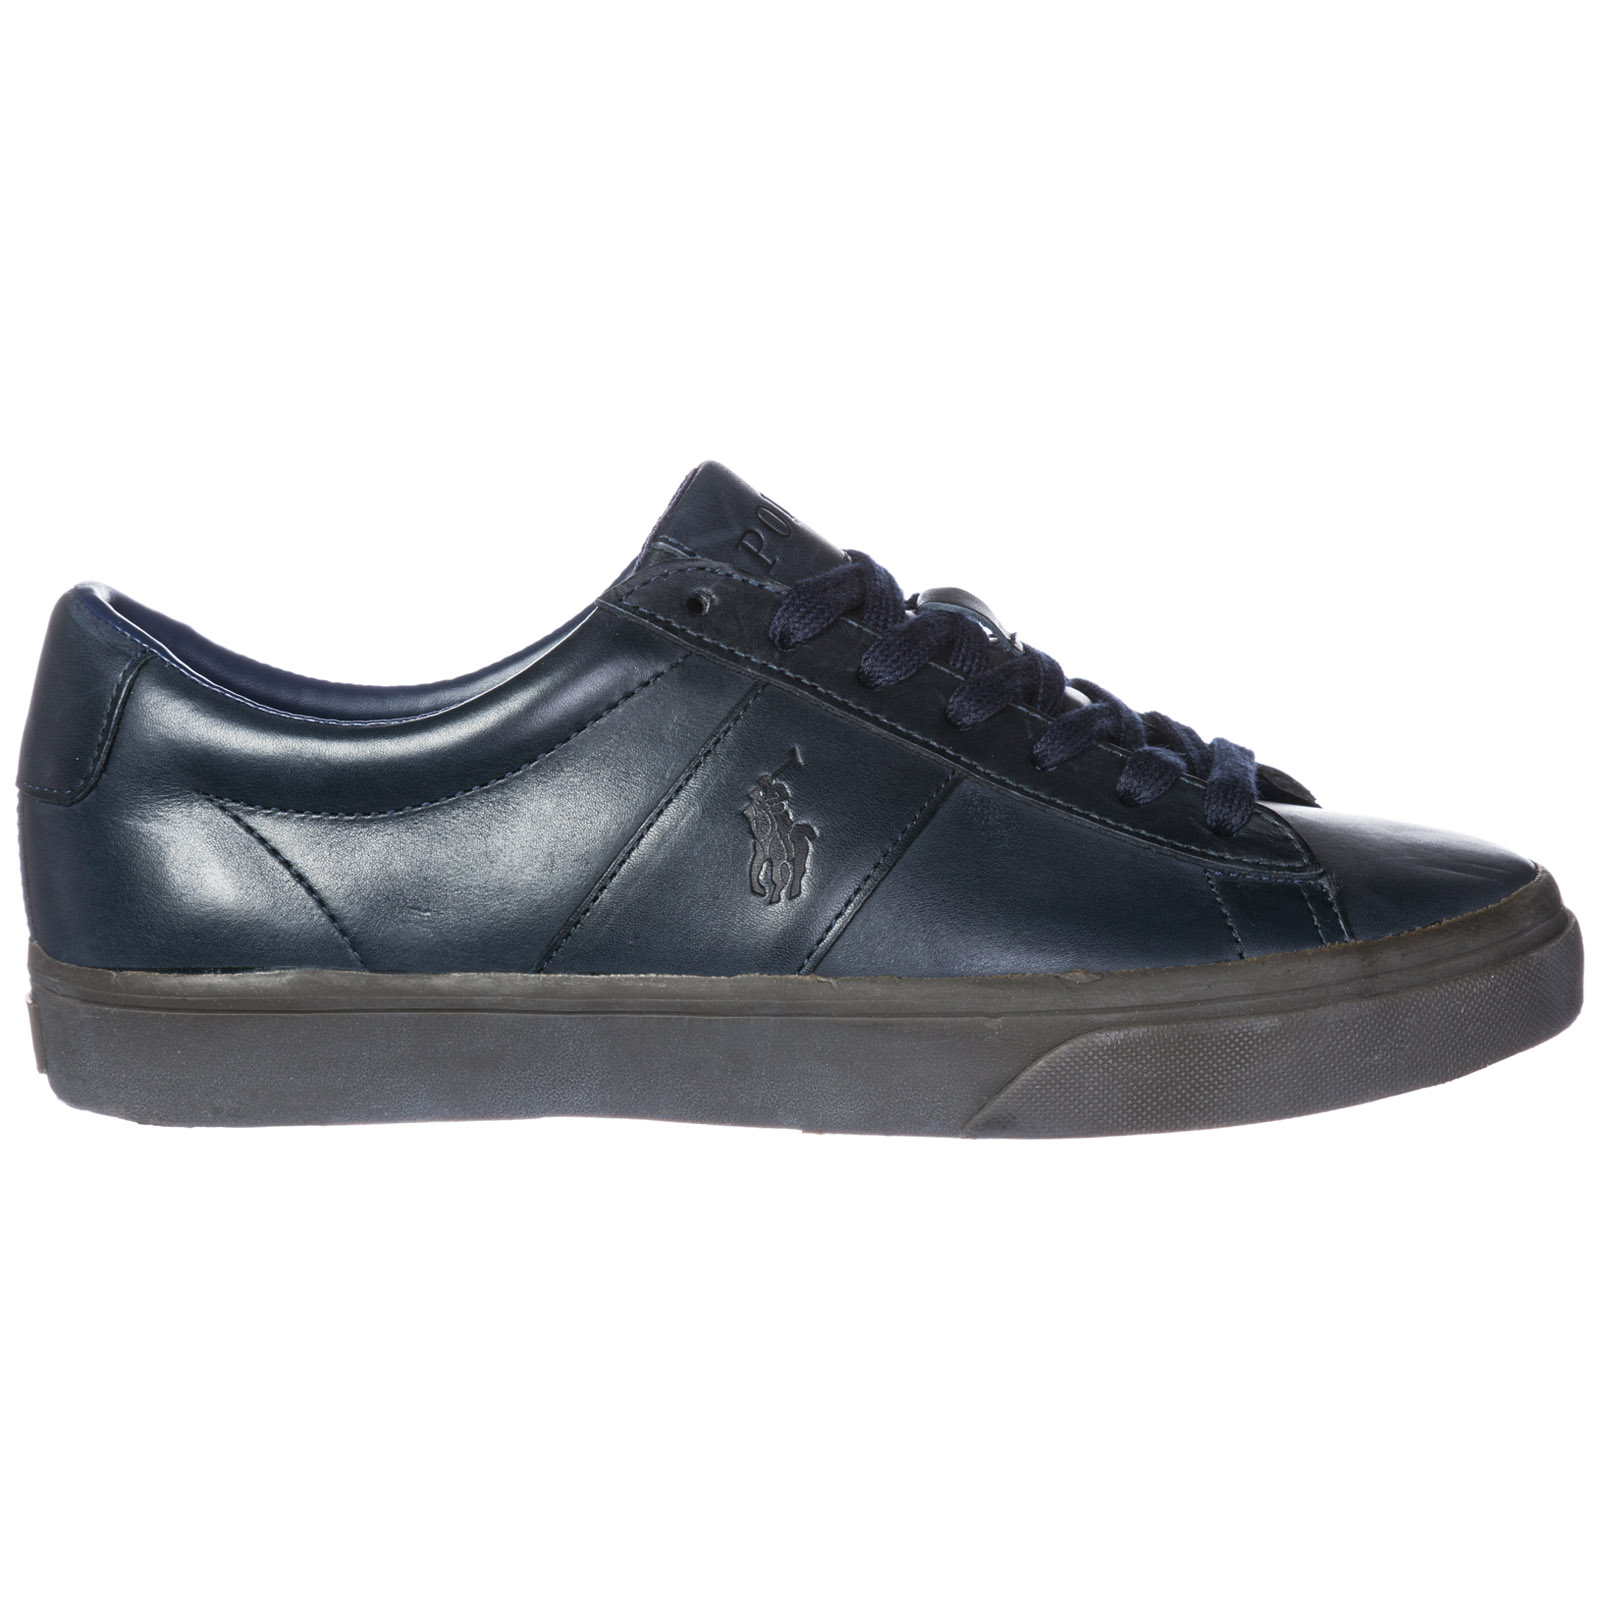 0555c8b1bc4 Sneakers Polo Ralph Lauren Sayer 816710018004 bright navy